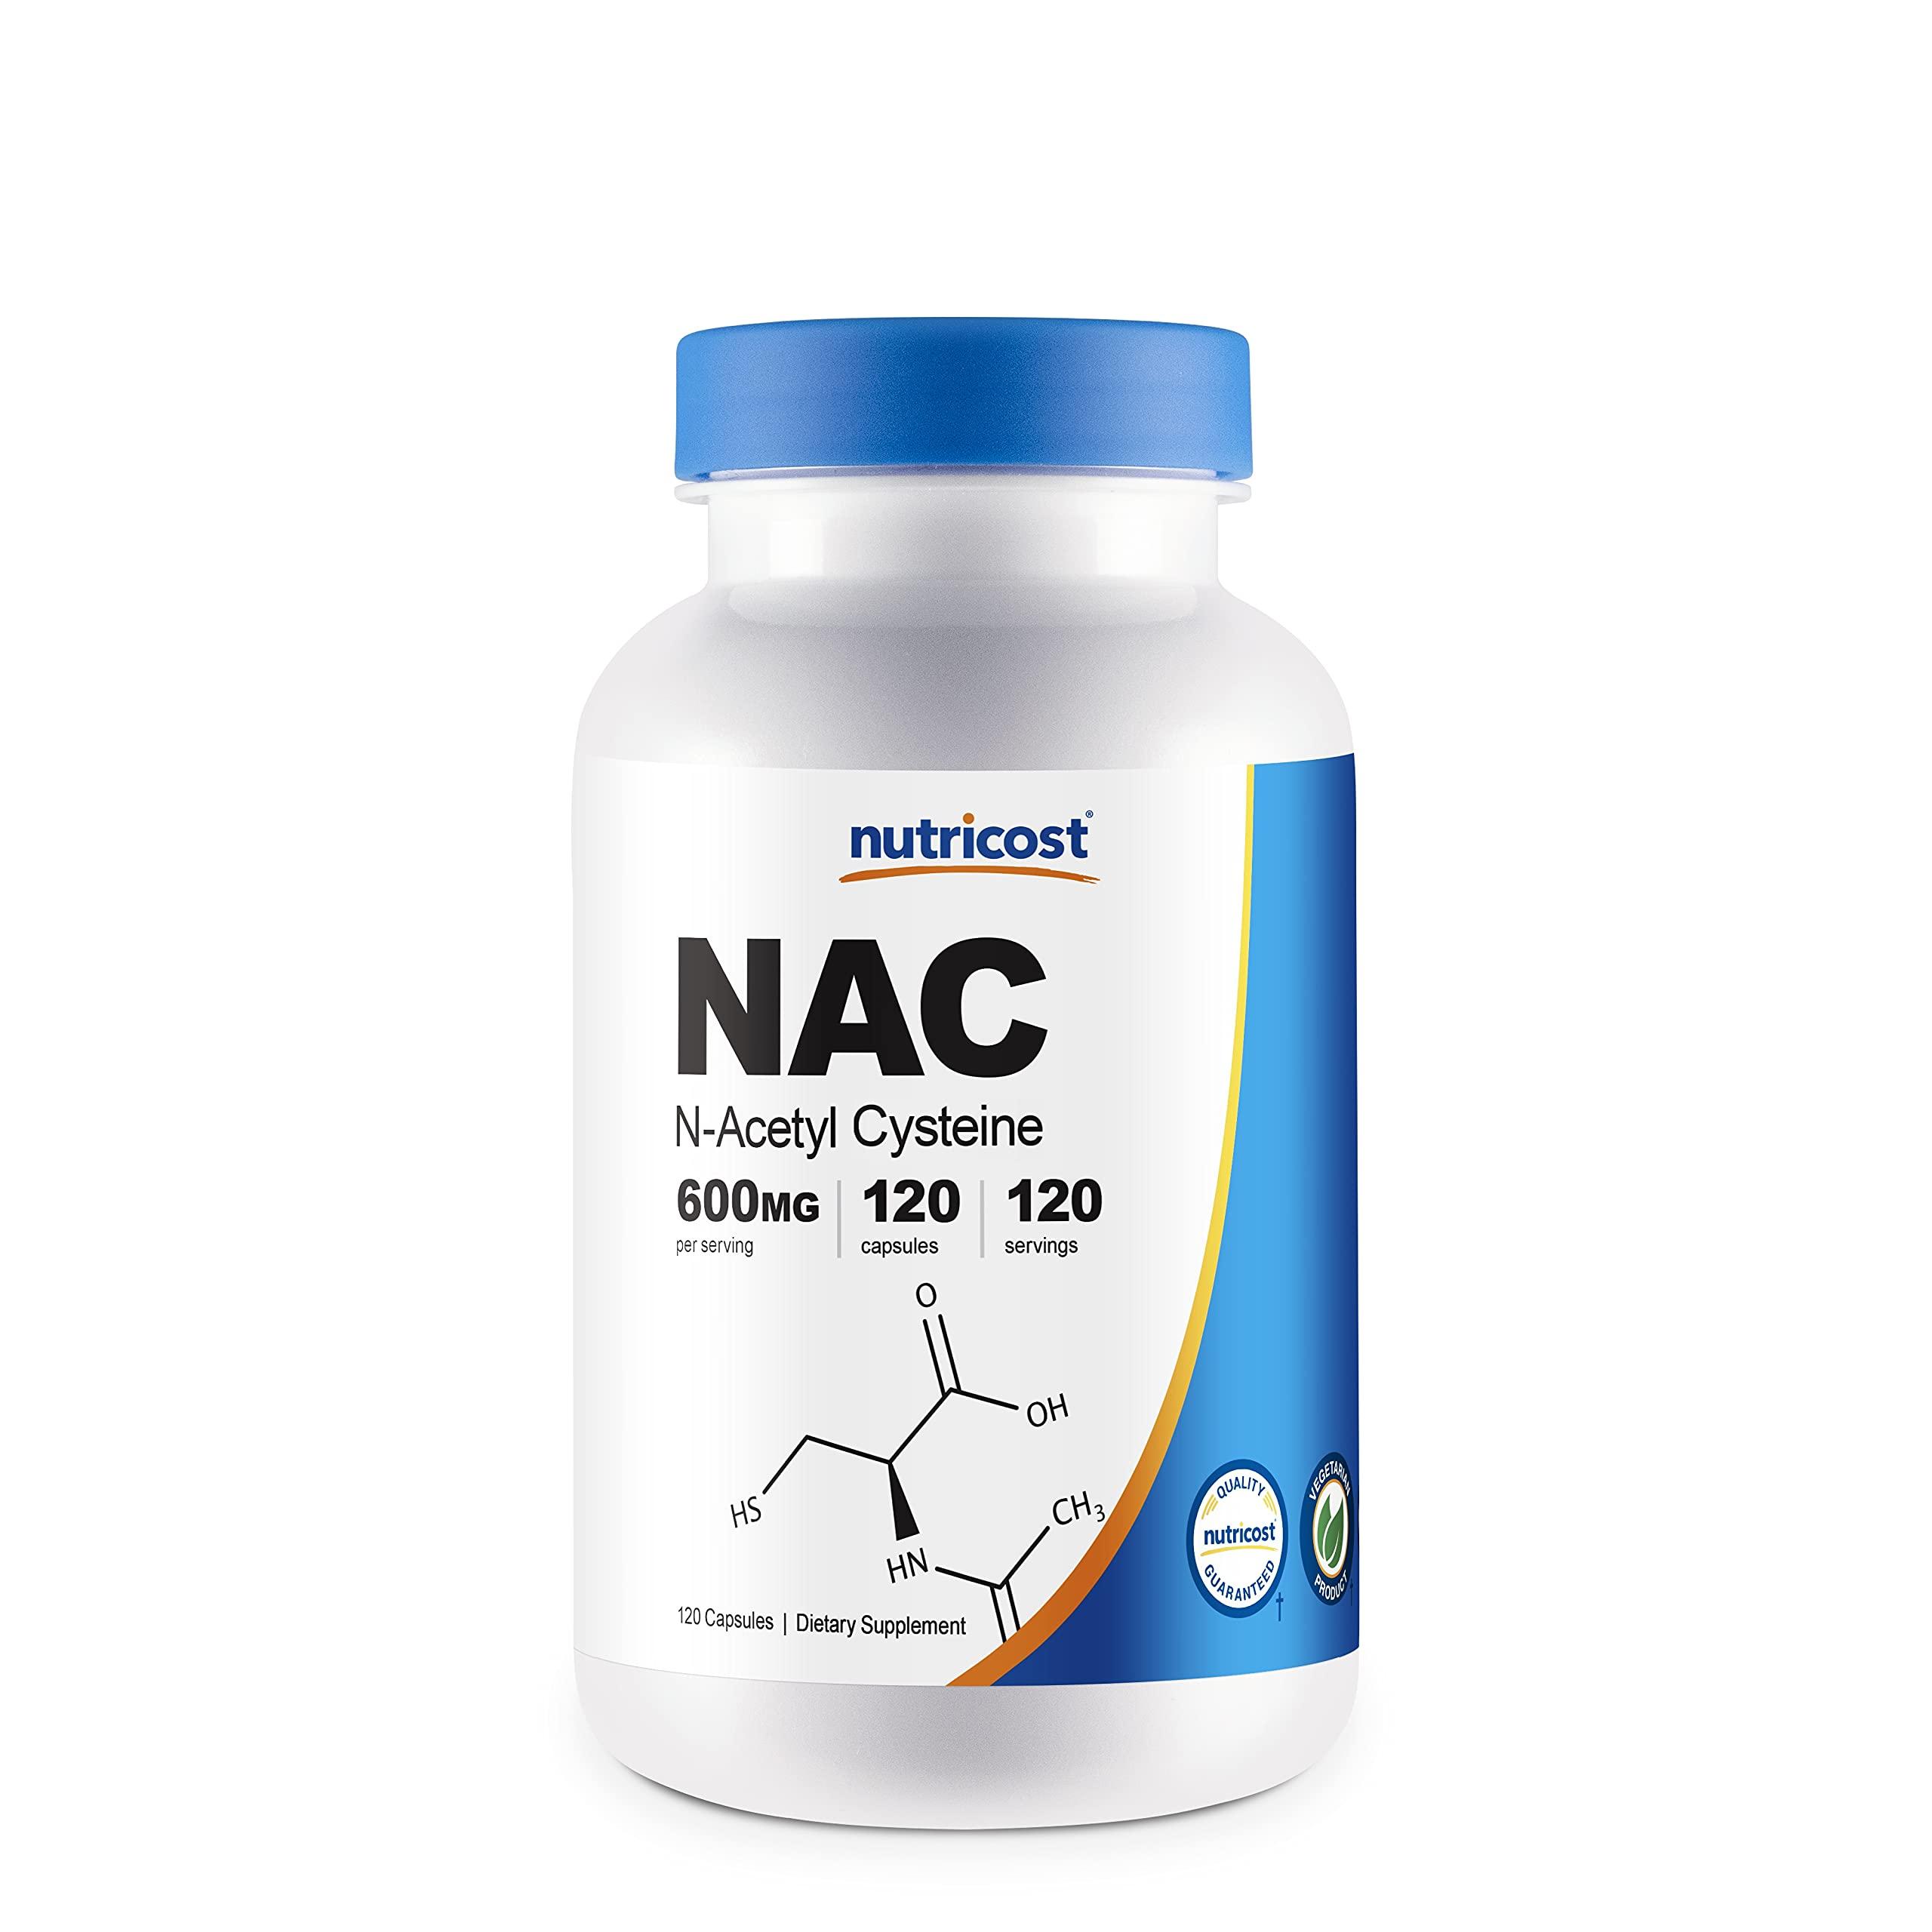 Nutricost N-Acetyl Cysteine (NAC) 600mg, 120 Vegetarian Capsules - Non-GMO, Gluten Free, Vegetarian Caps